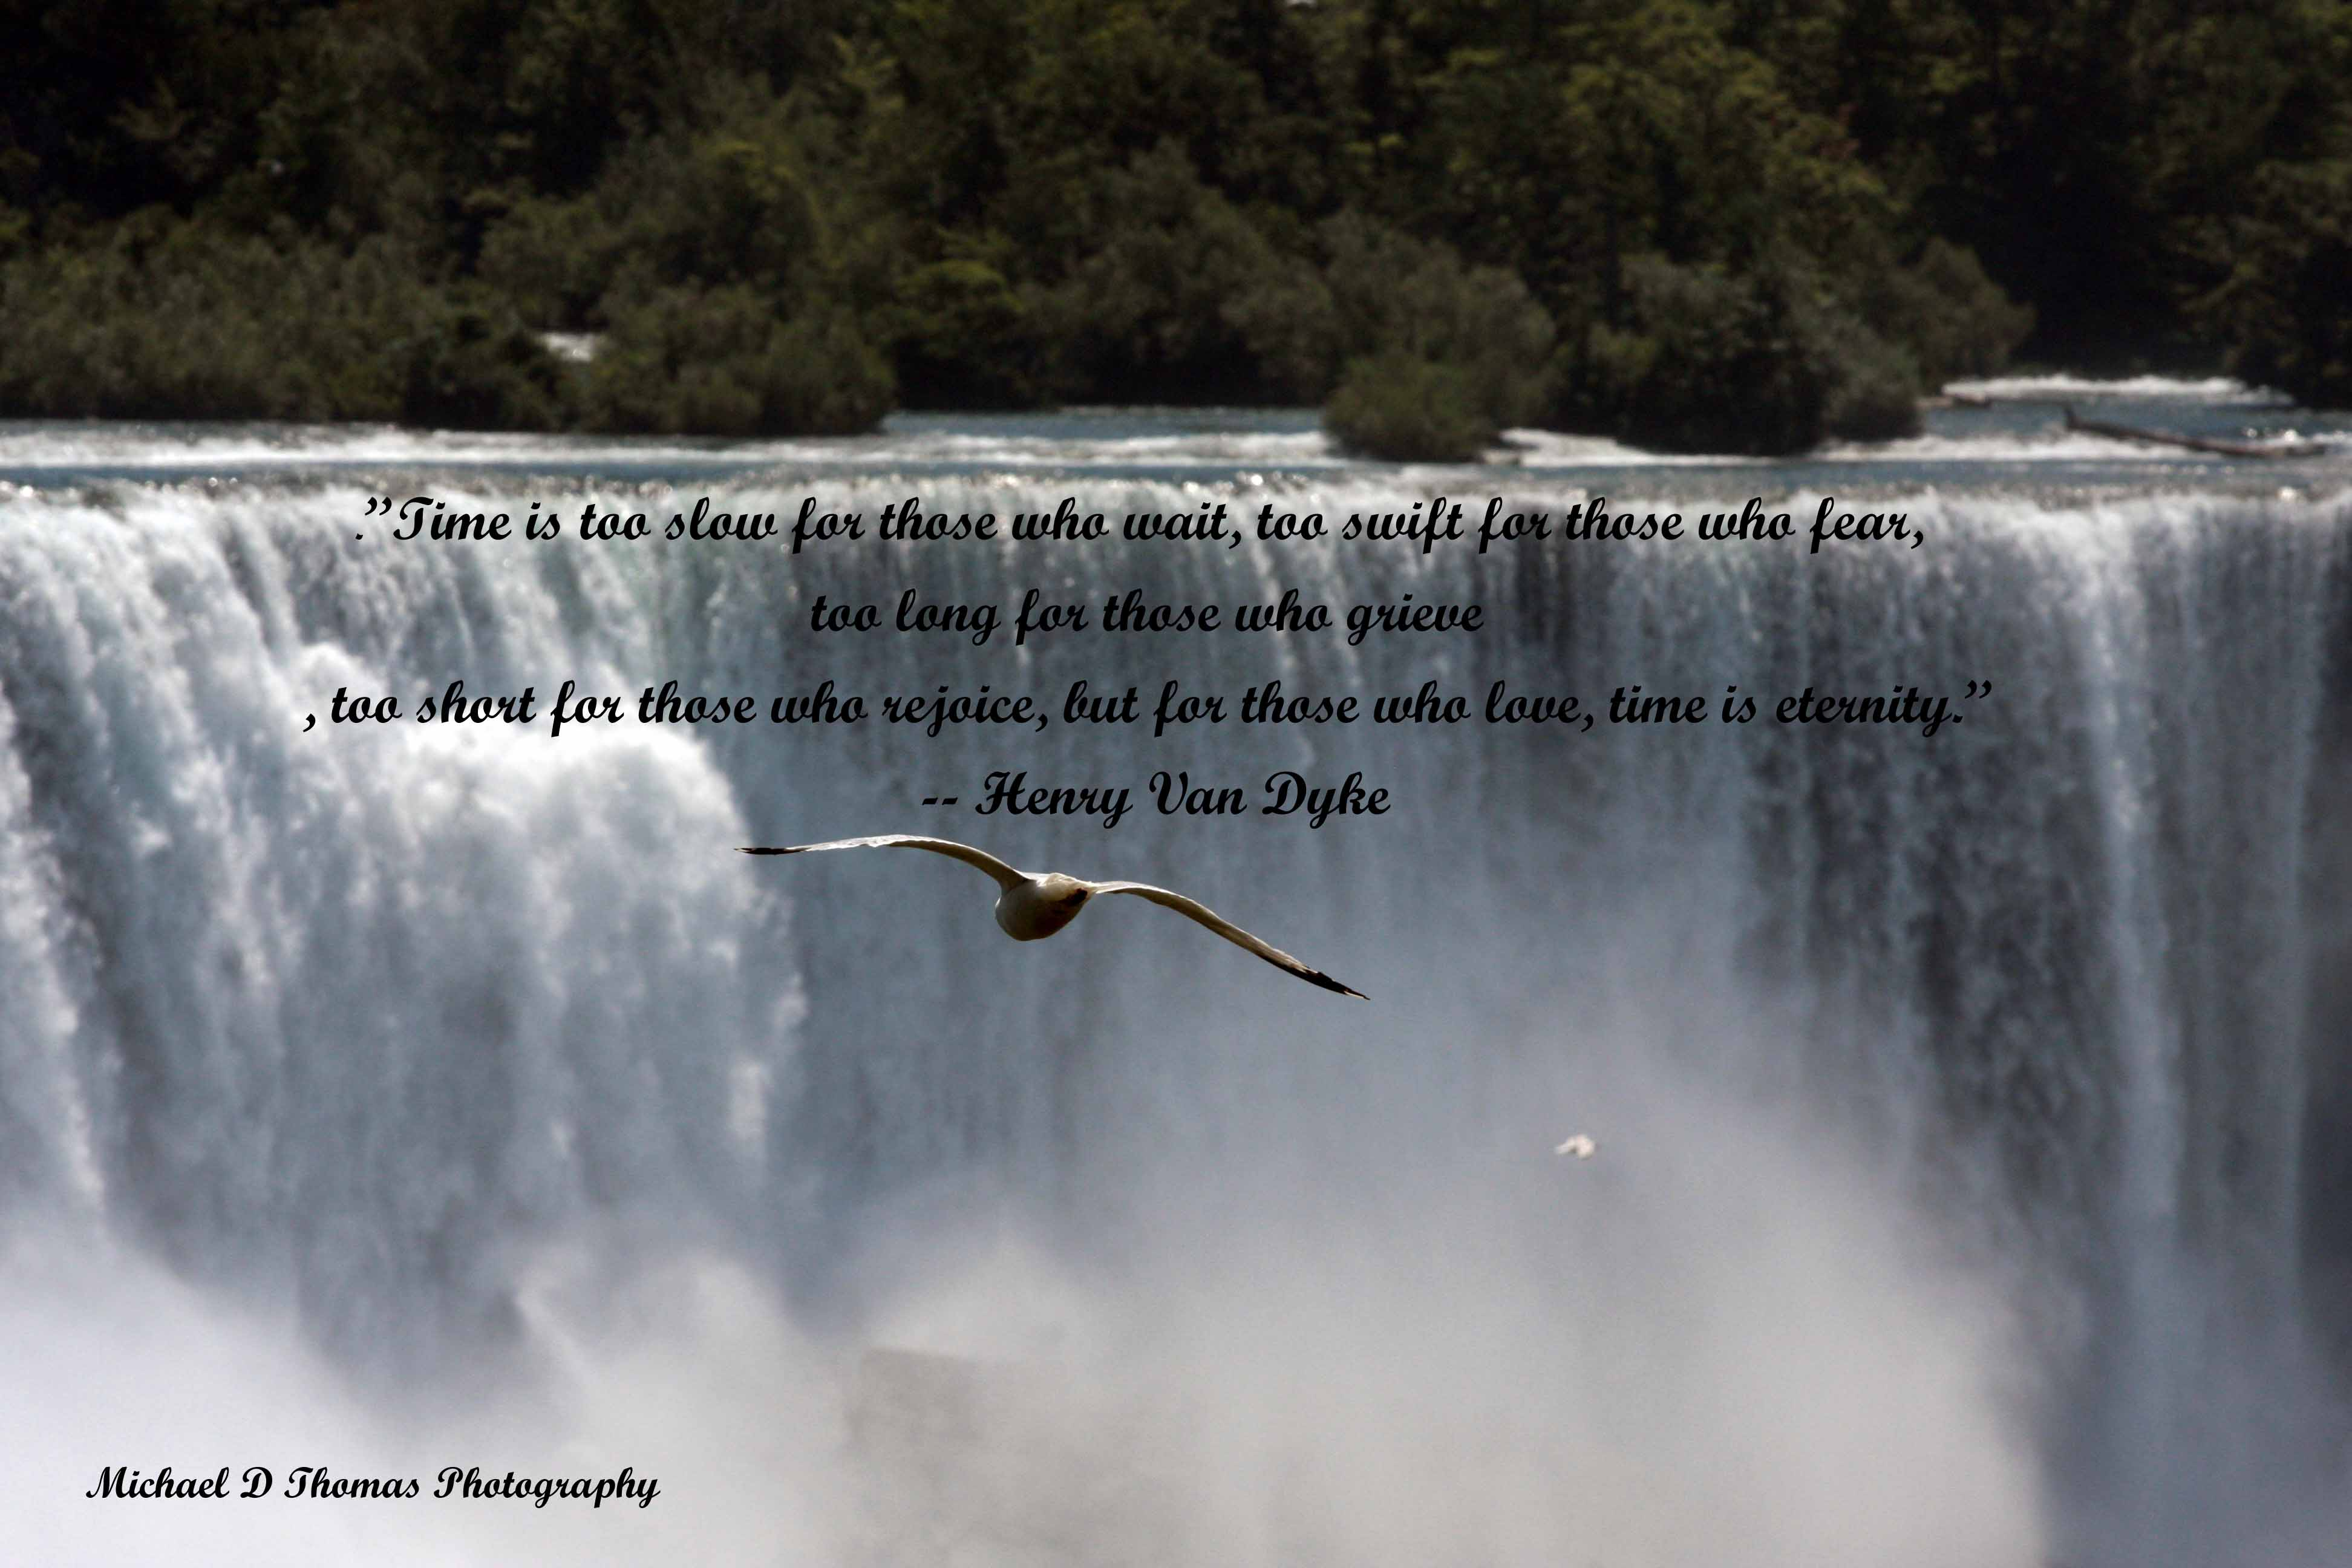 Picnic quote #2